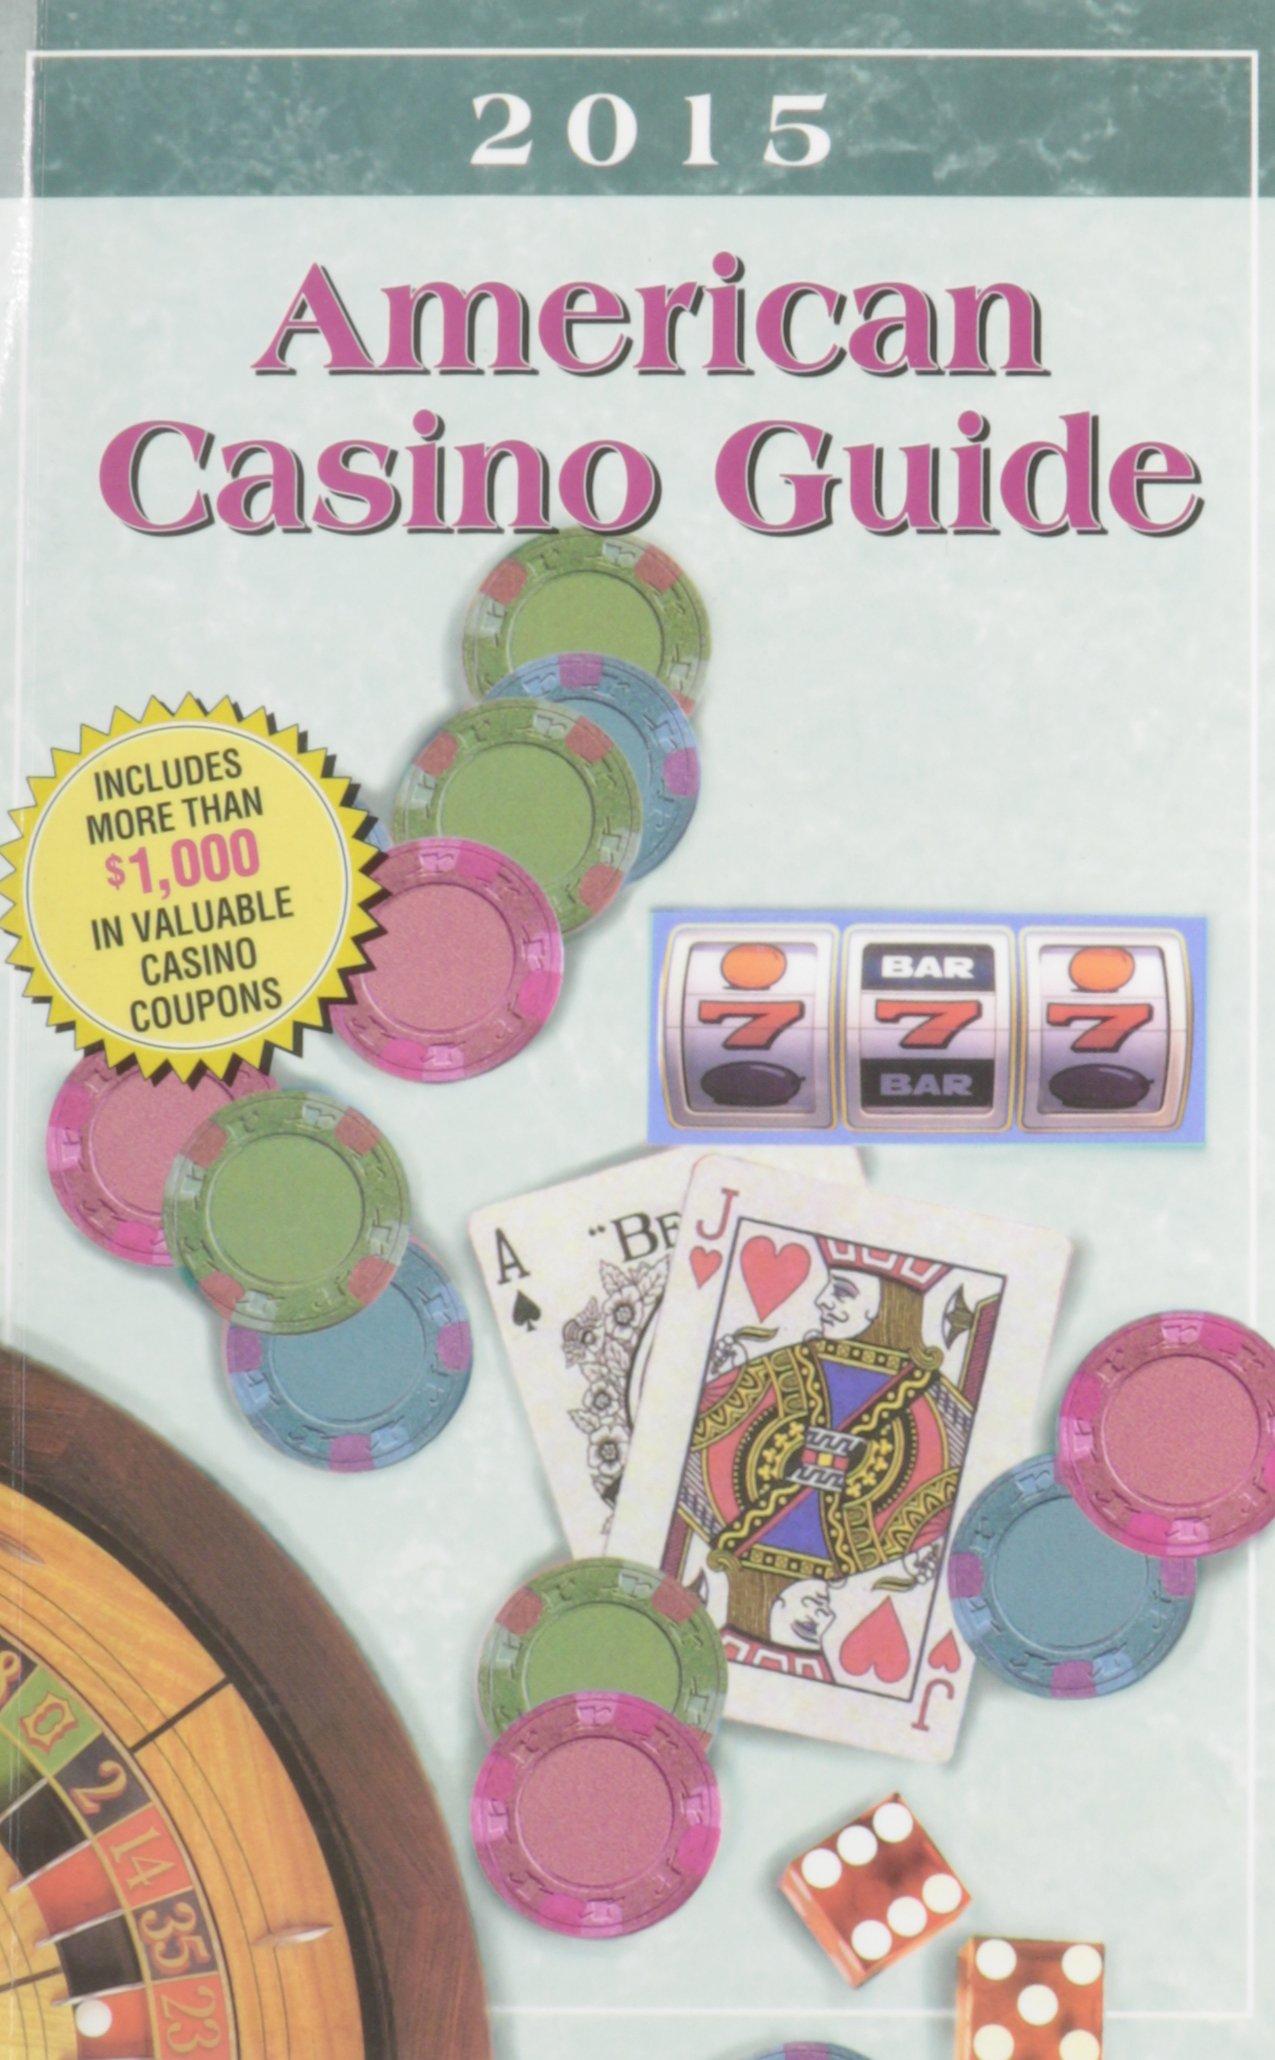 American casino guide coupon gold strike casino in las vegas